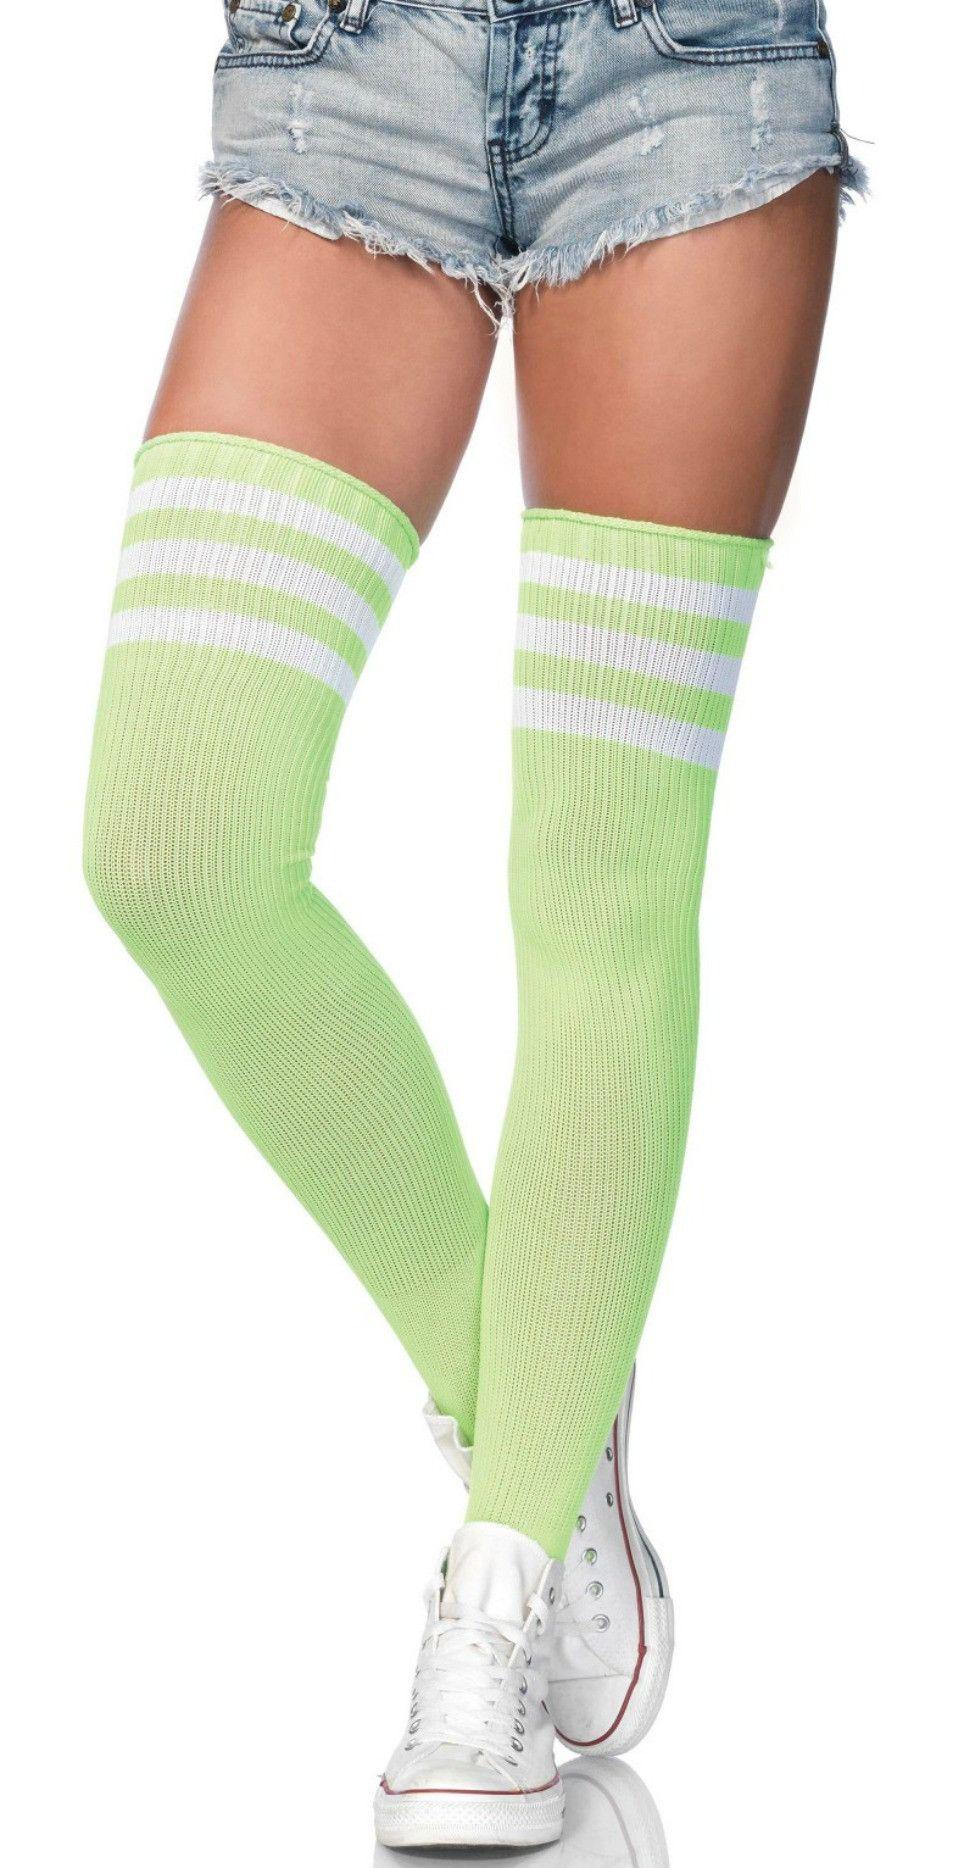 16caeae2cb3 Lime Green and White 3 Stripe Thigh High Socks